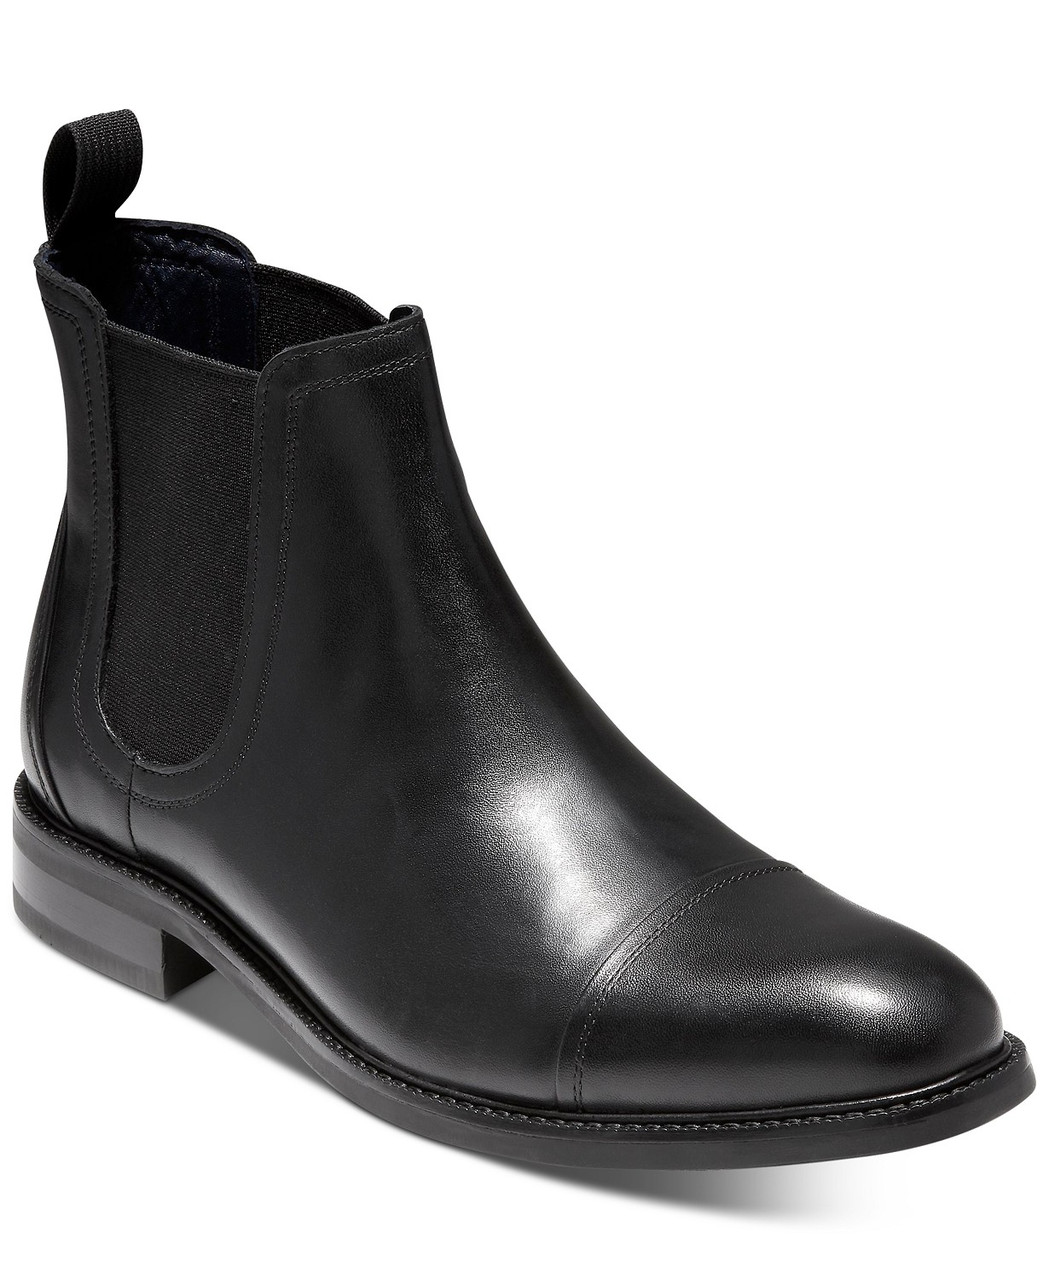 Cole Haan Мужские ботинки челси - Е2